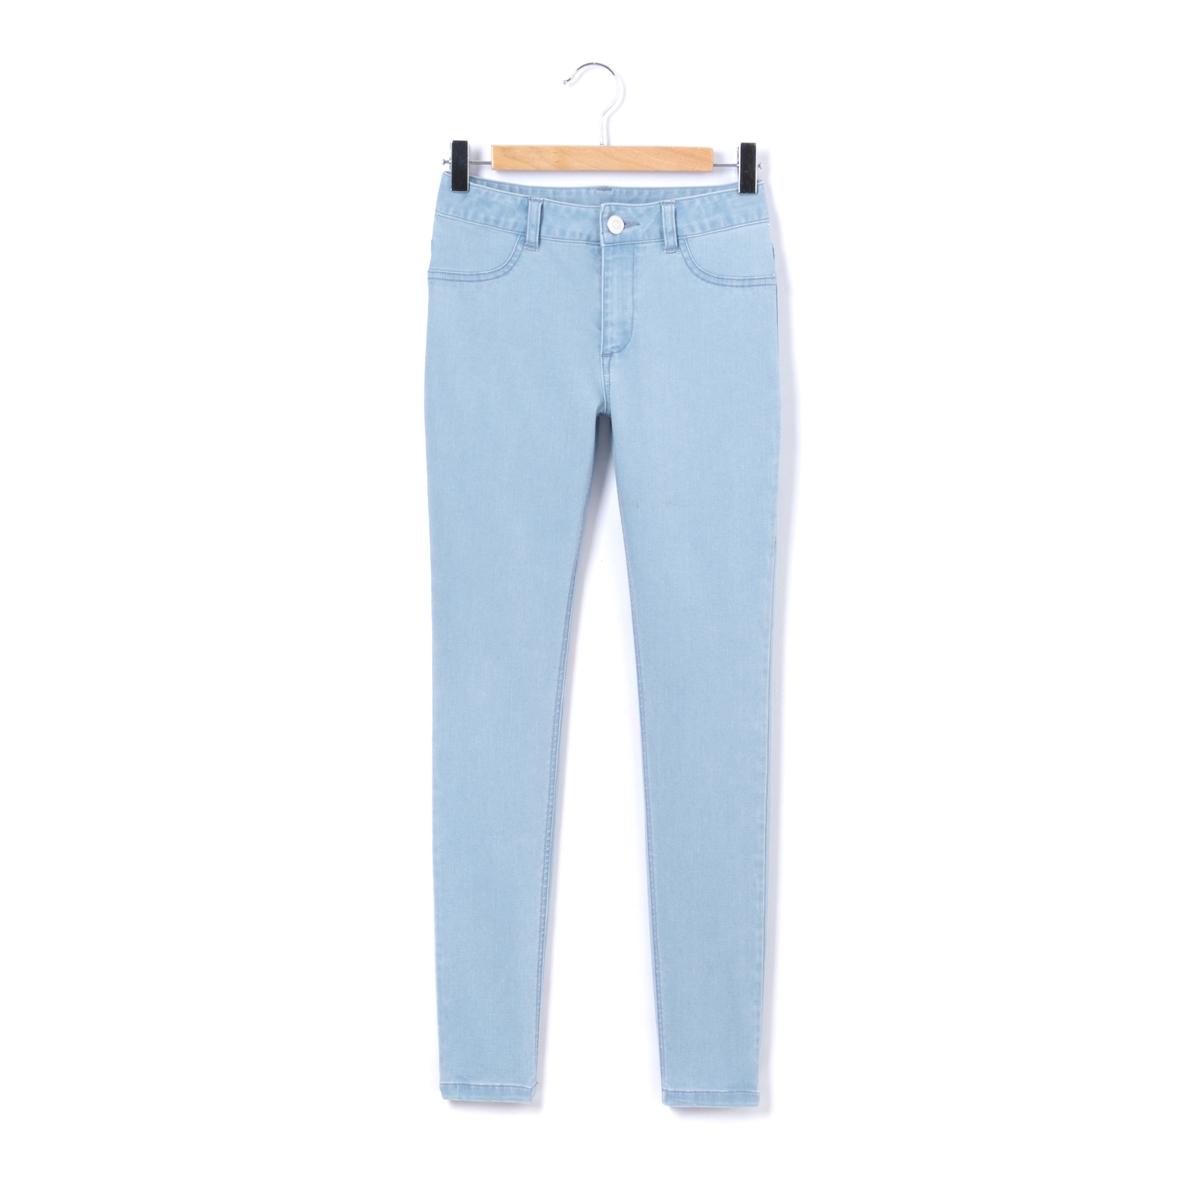 Skinny Jeans, 10 16 Jahre